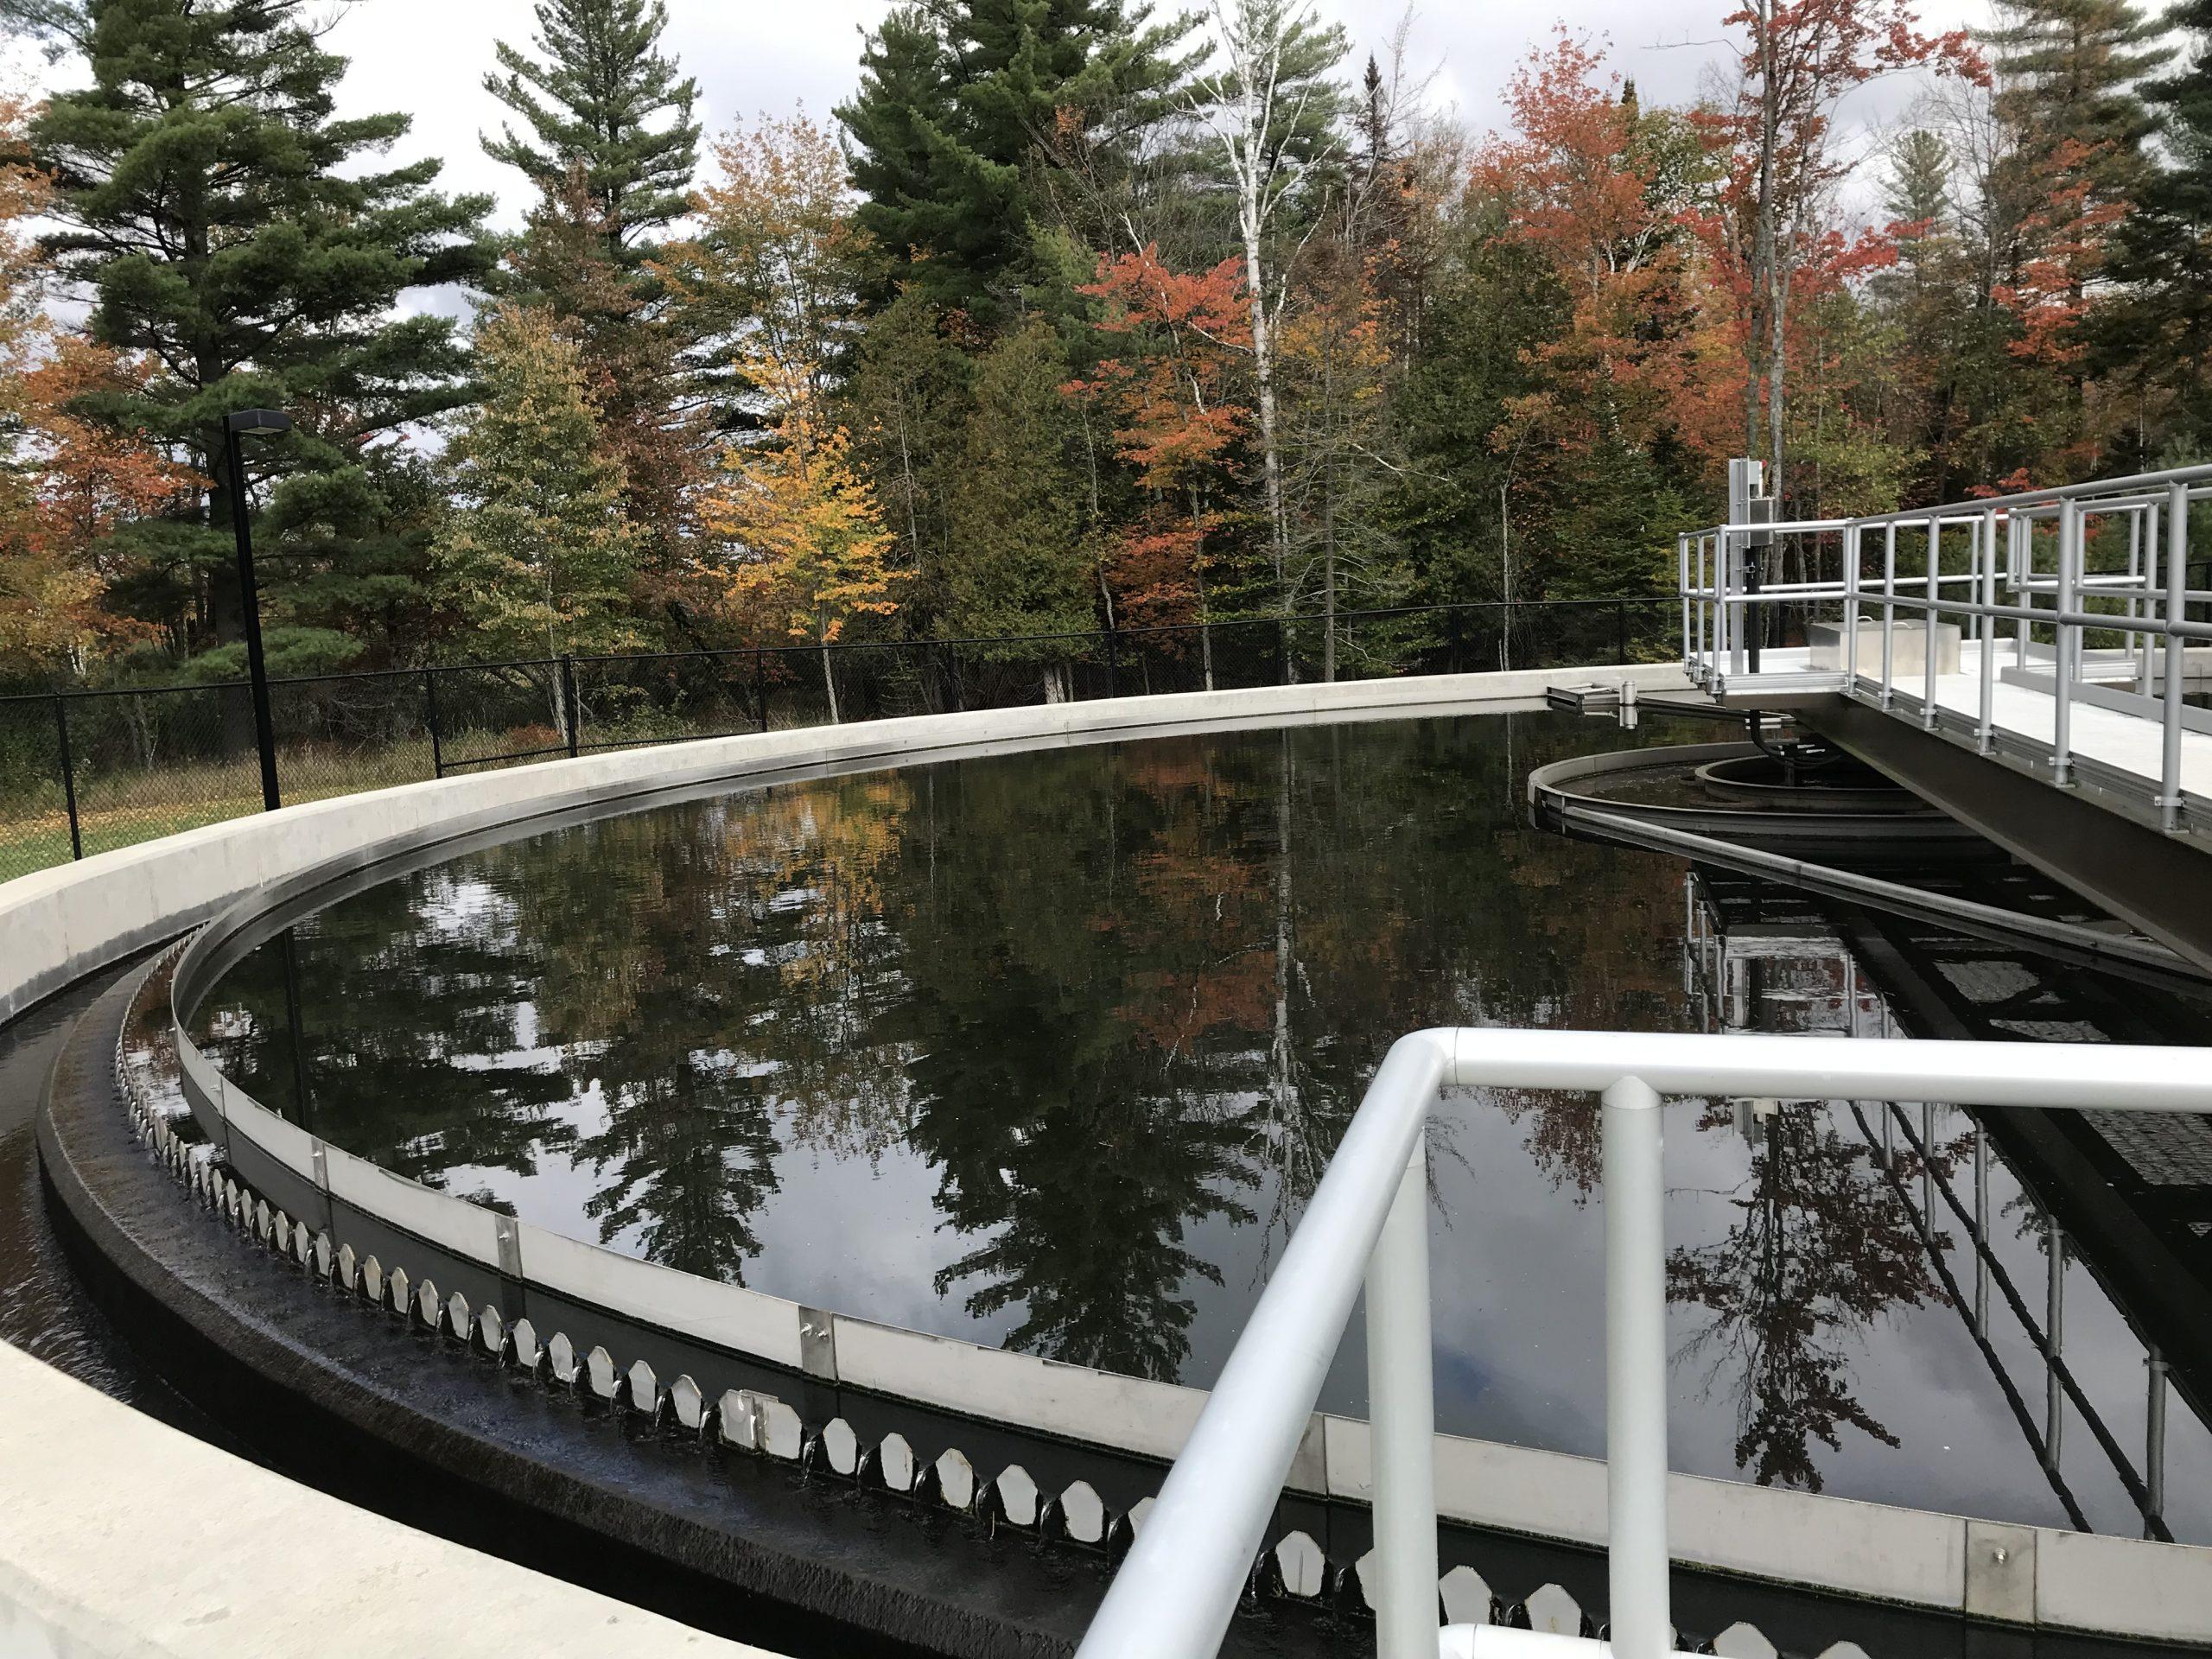 Image of water basin.